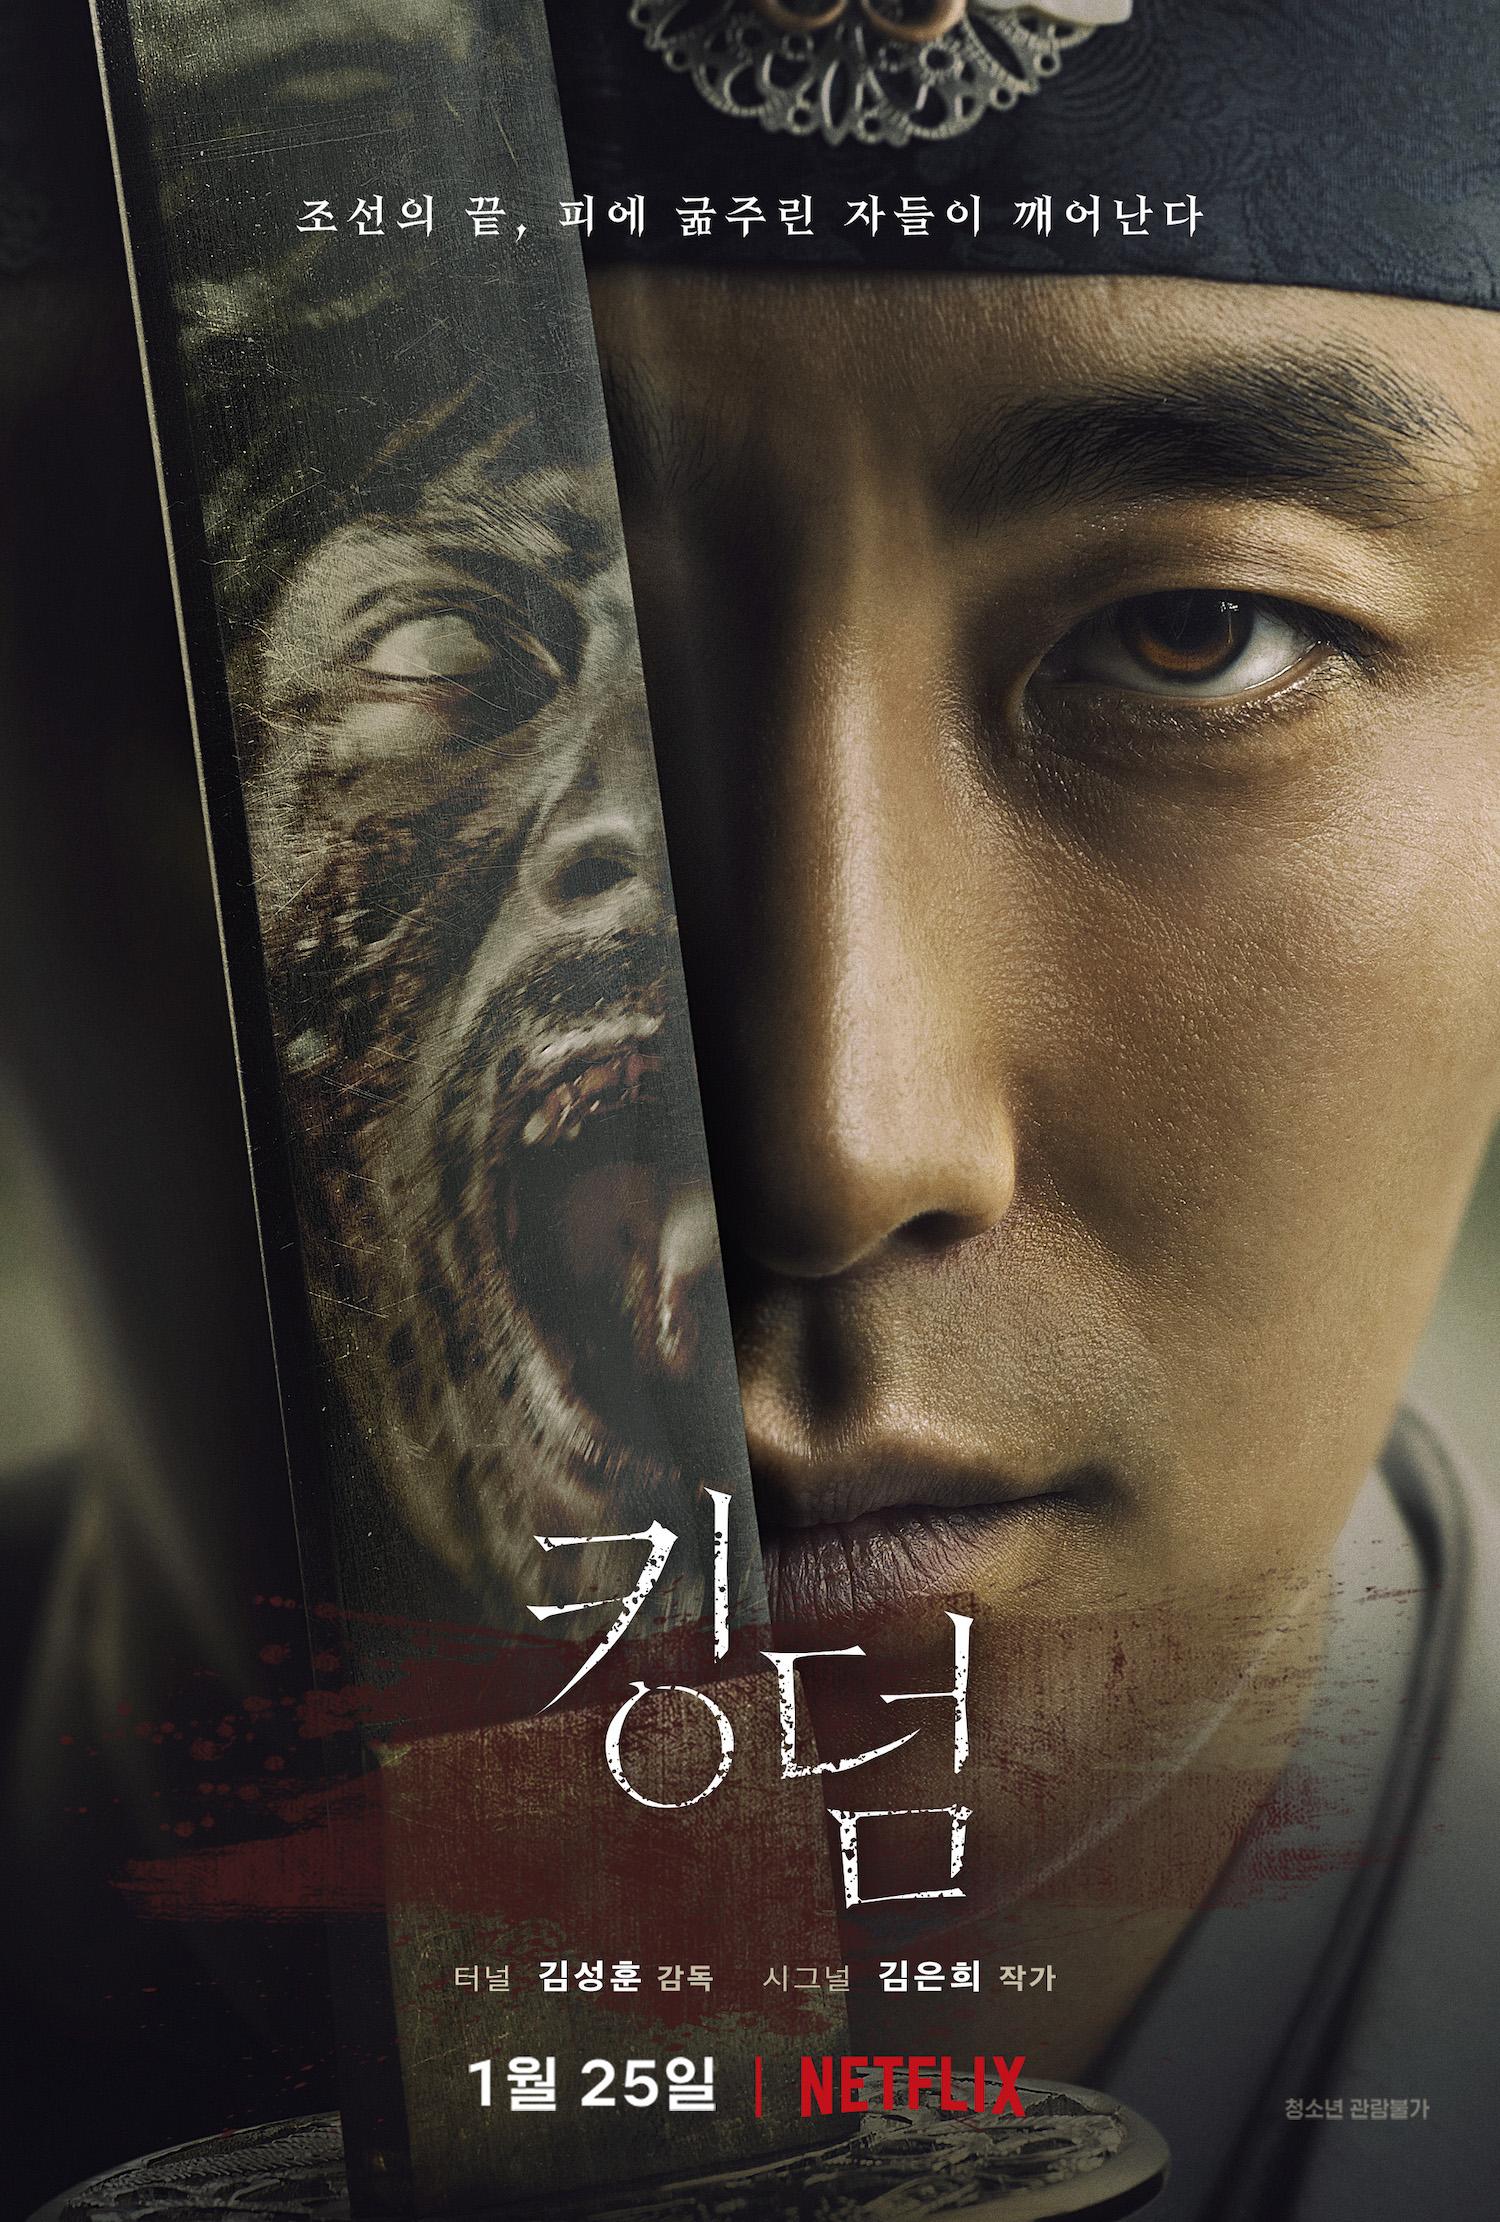 "2019 Kingdom مشاهدة الدراما الكورية ""مملكة"". تقرير عن الدراما +الأبطال+ حلقات مترجمة أونلاين وبجودة عالية . مسلسل مملكة مترجم. مسلسل Kingdom الكوري مترجم."